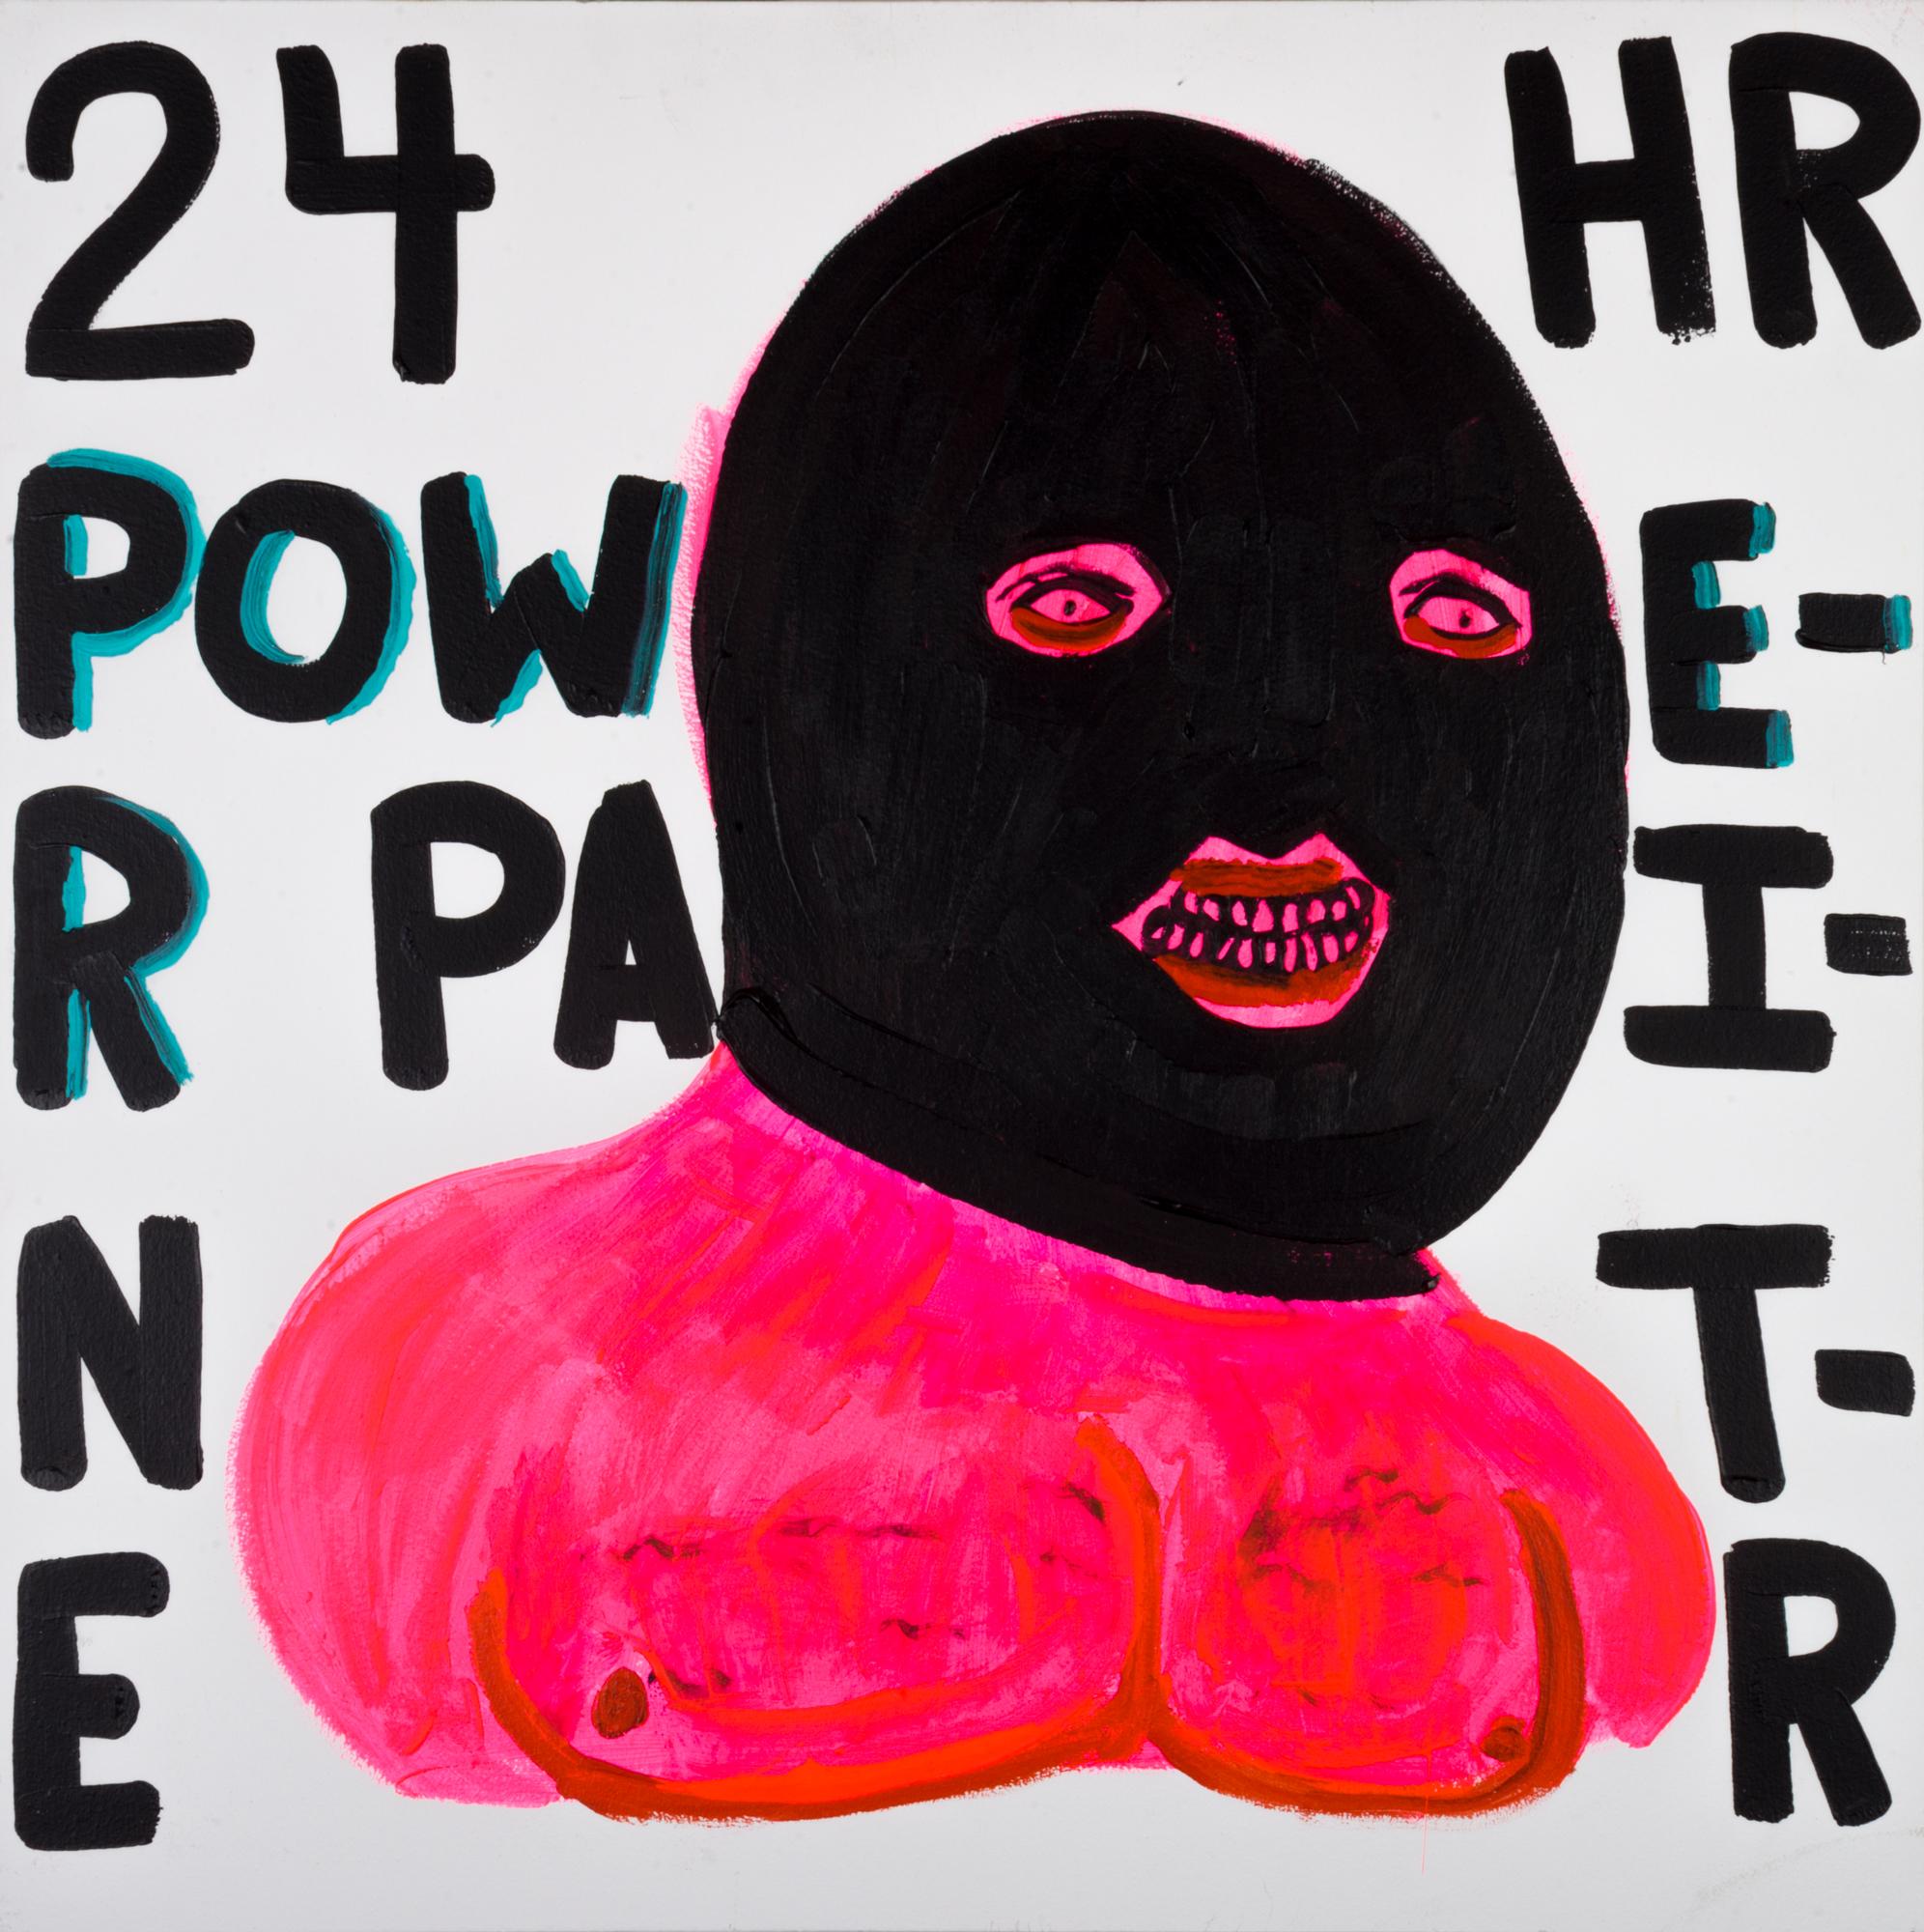 24_hr_pwr_painter_norberto_gomez2018.jpg